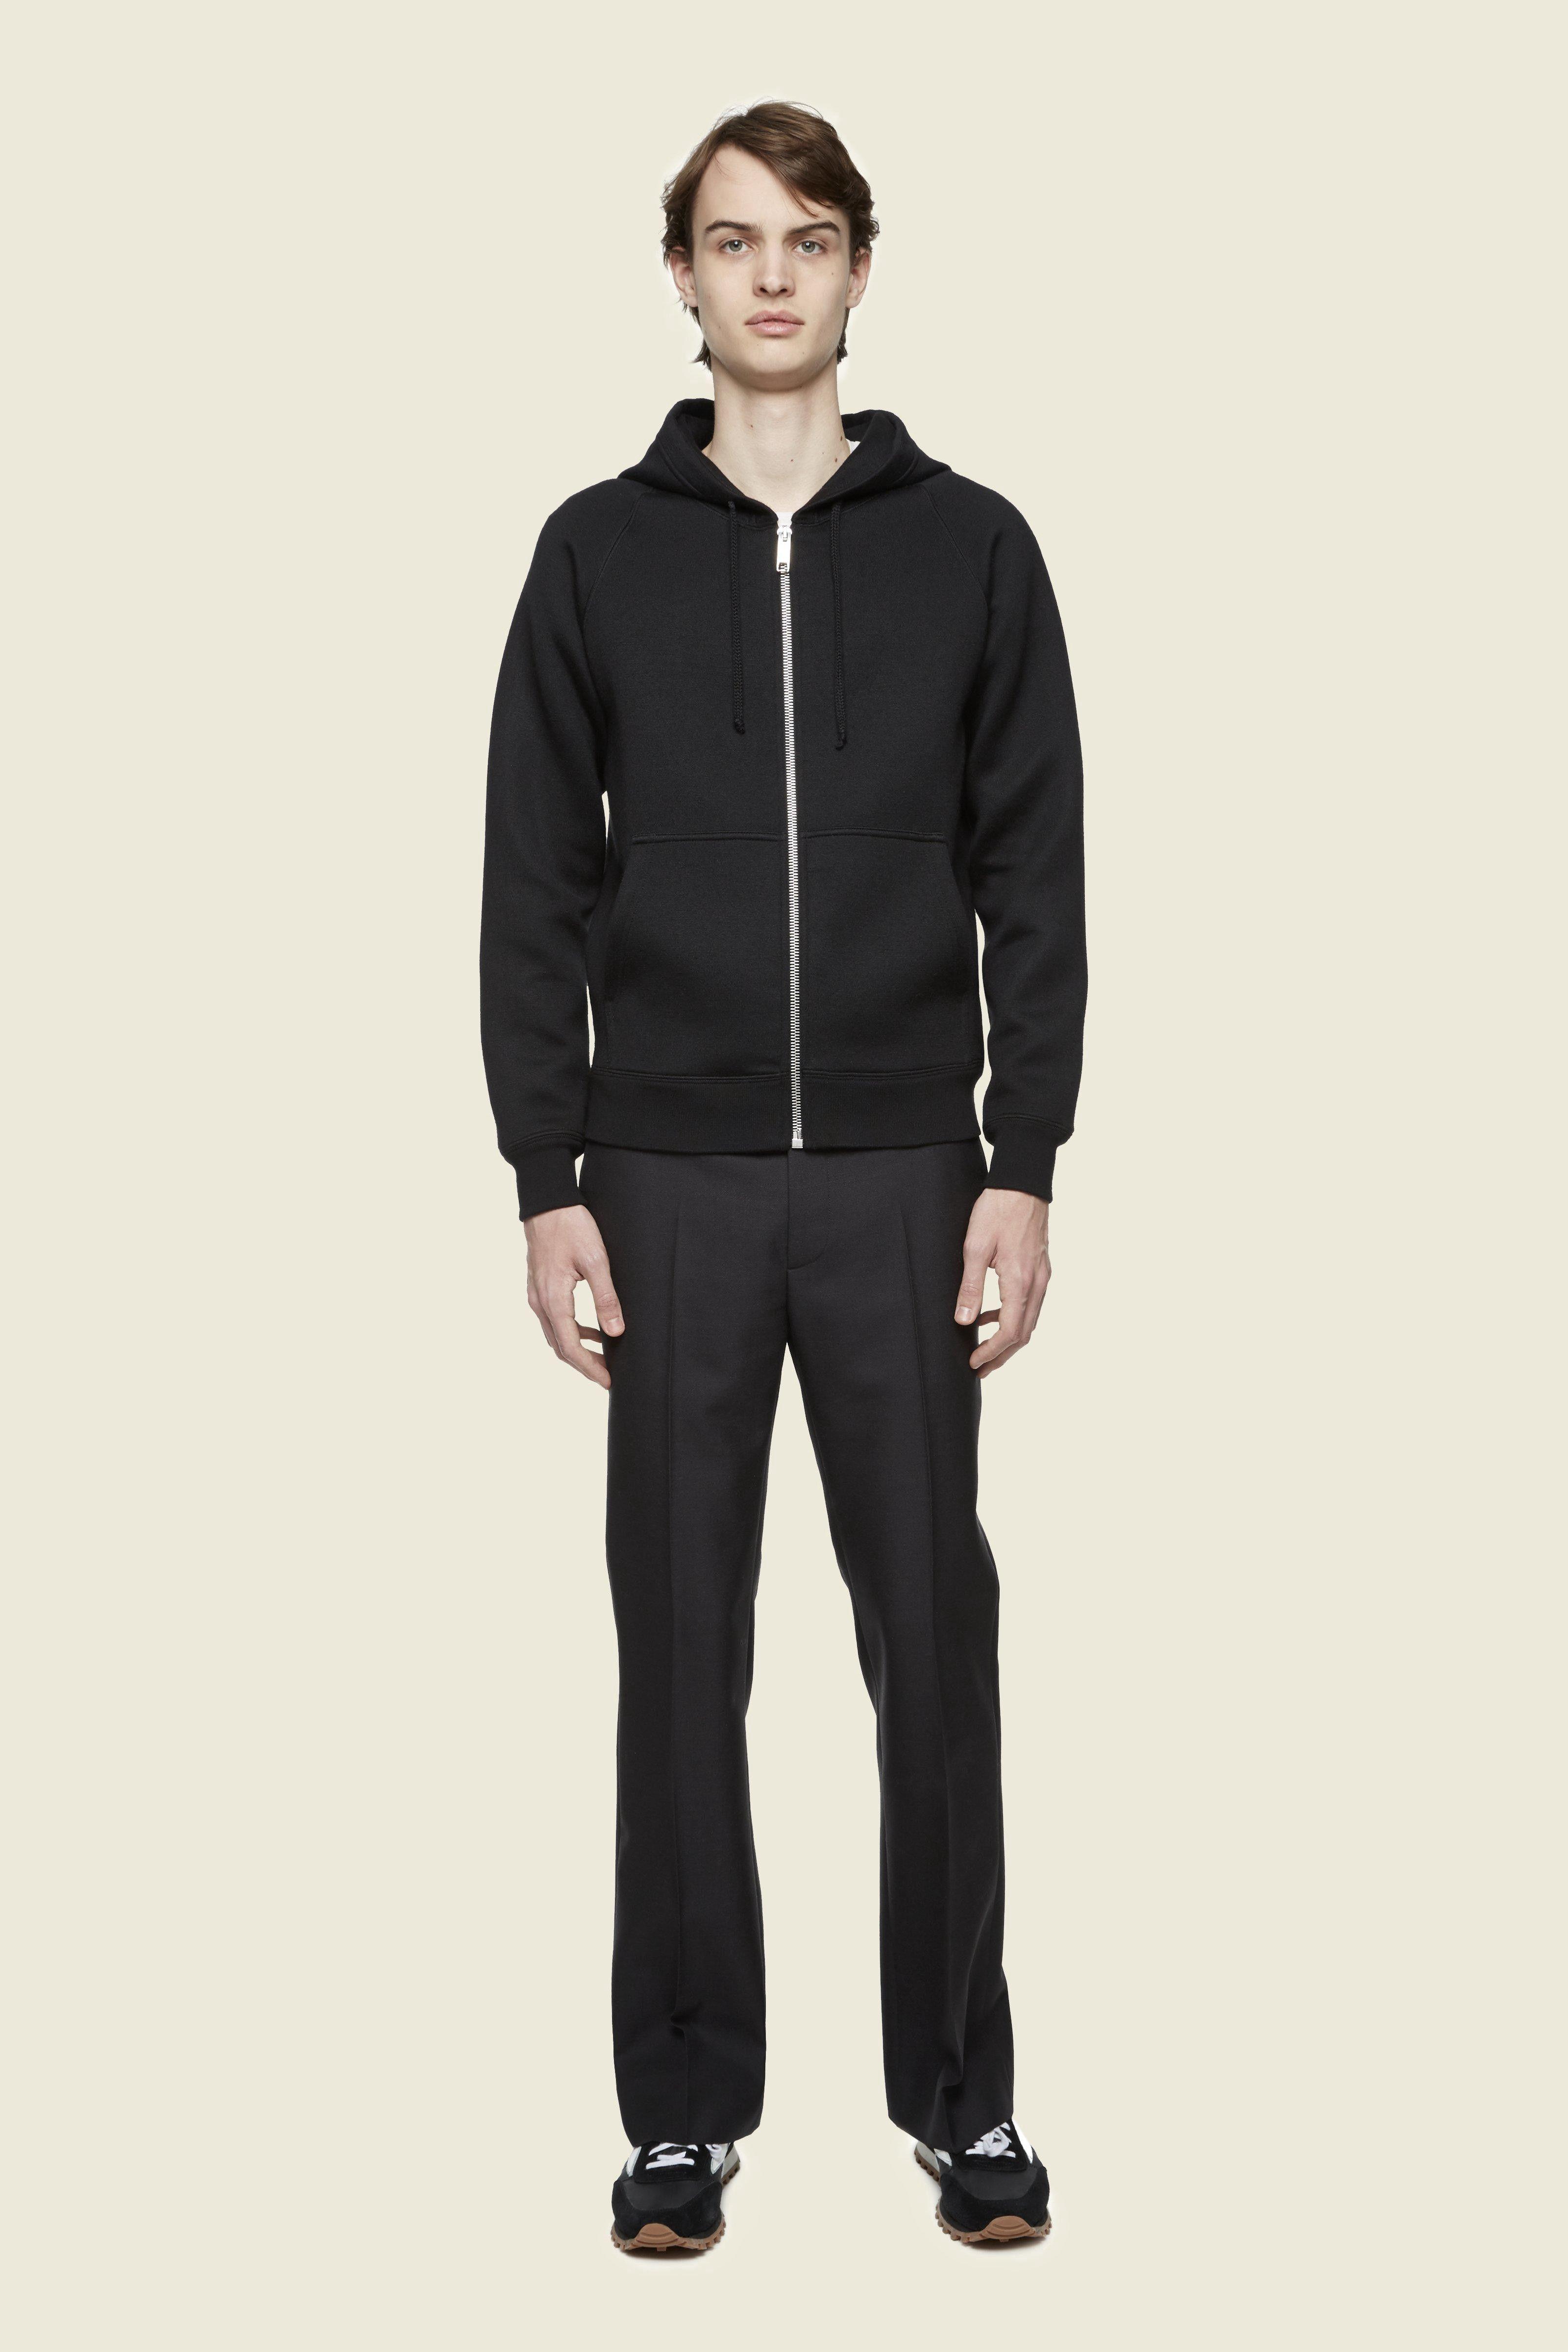 Marc Jacobs Manrico Sweatshirt In Aubergine Modesens Sweatshirts Sweater Fashion Marc Jacobs [ 4800 x 3200 Pixel ]